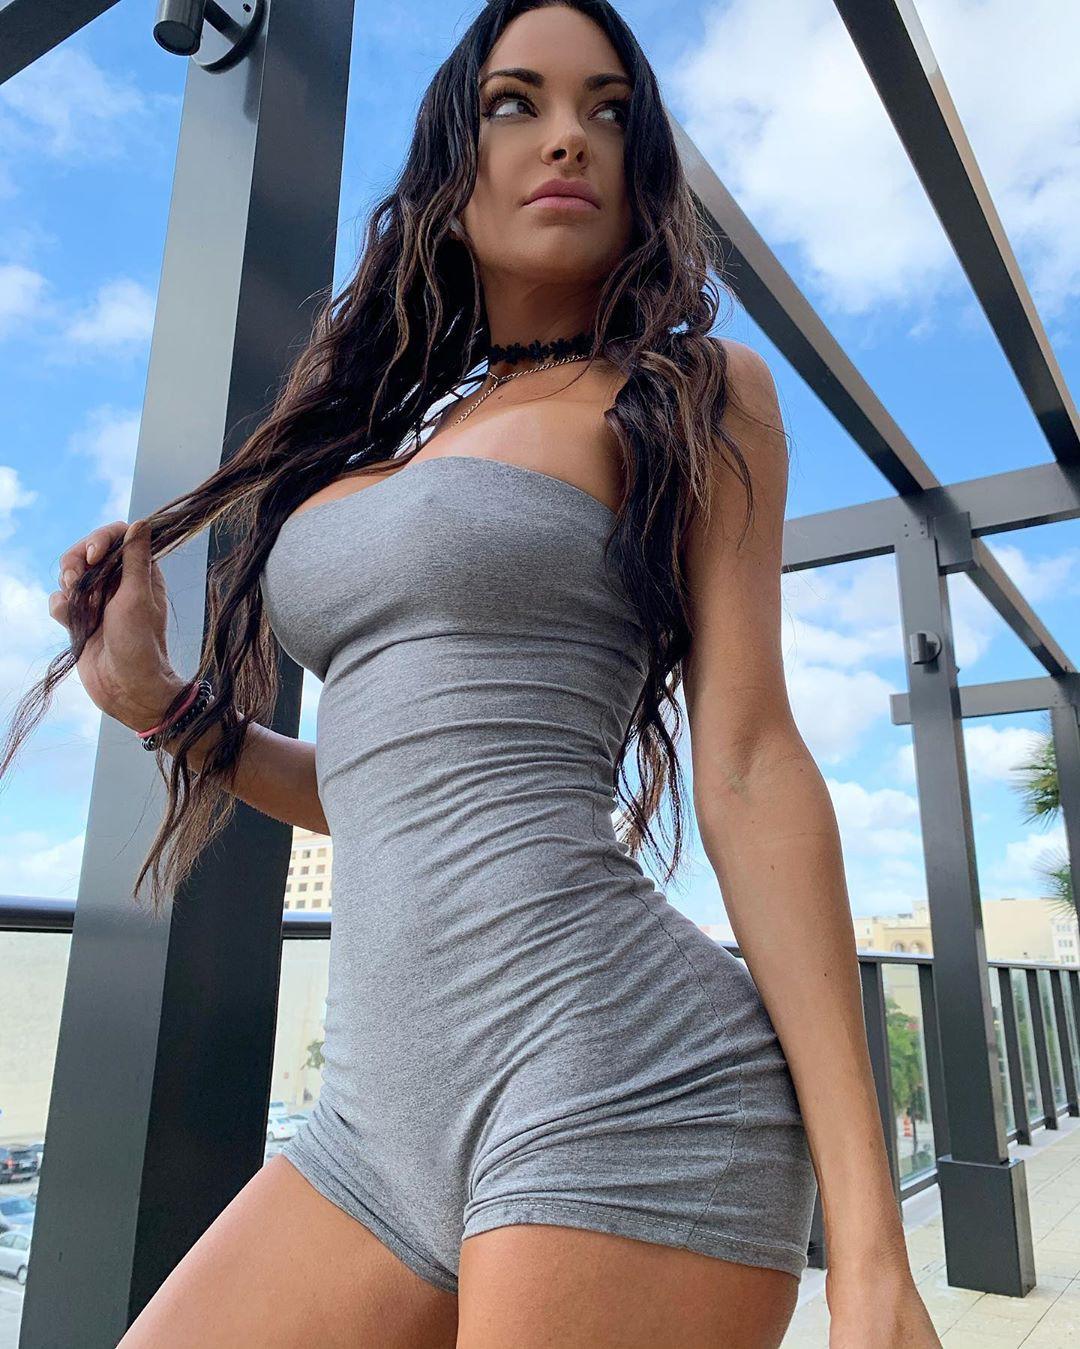 Nienna Jade hot girls photoshoot, woman thighs, legs pic